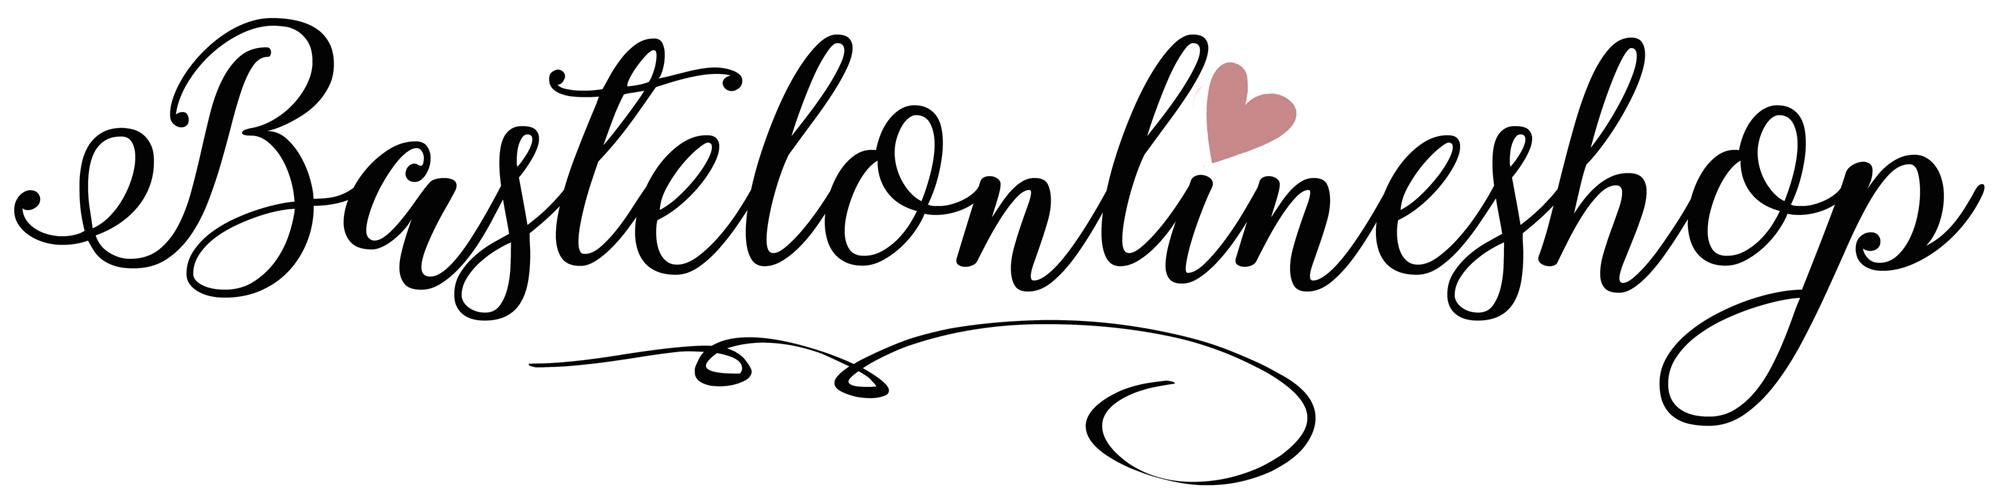 Bastelonlineshop24-Logo